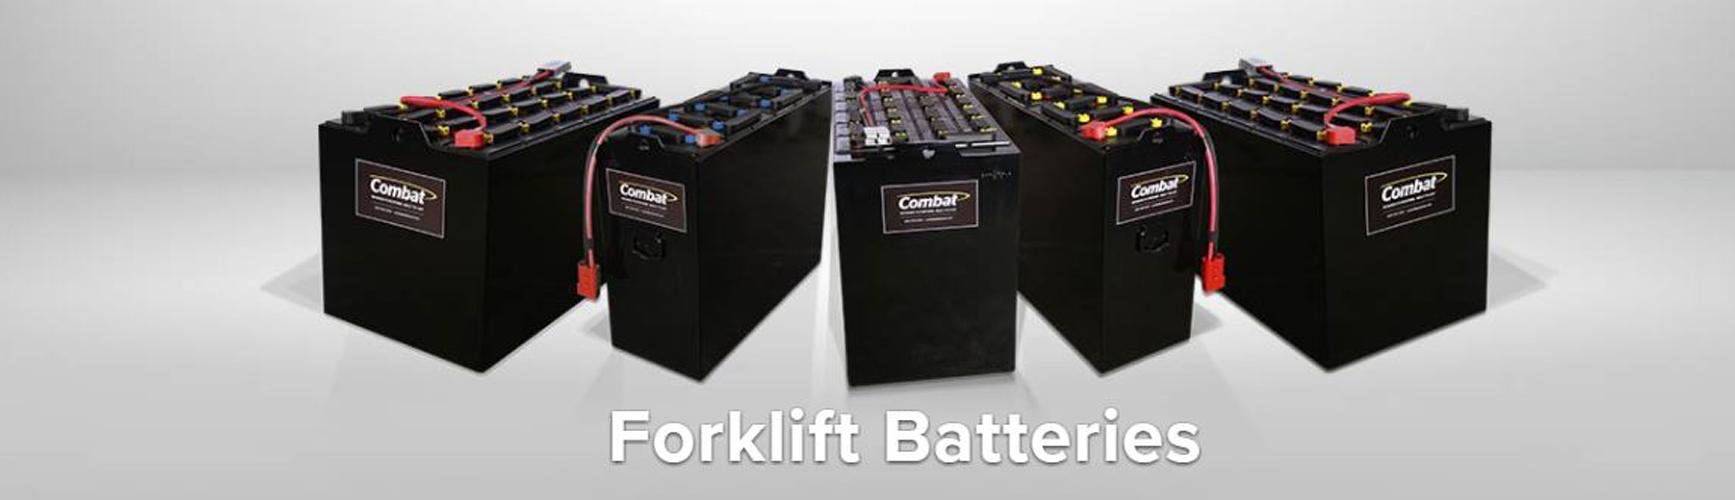 Battery-Main-Image-1.png